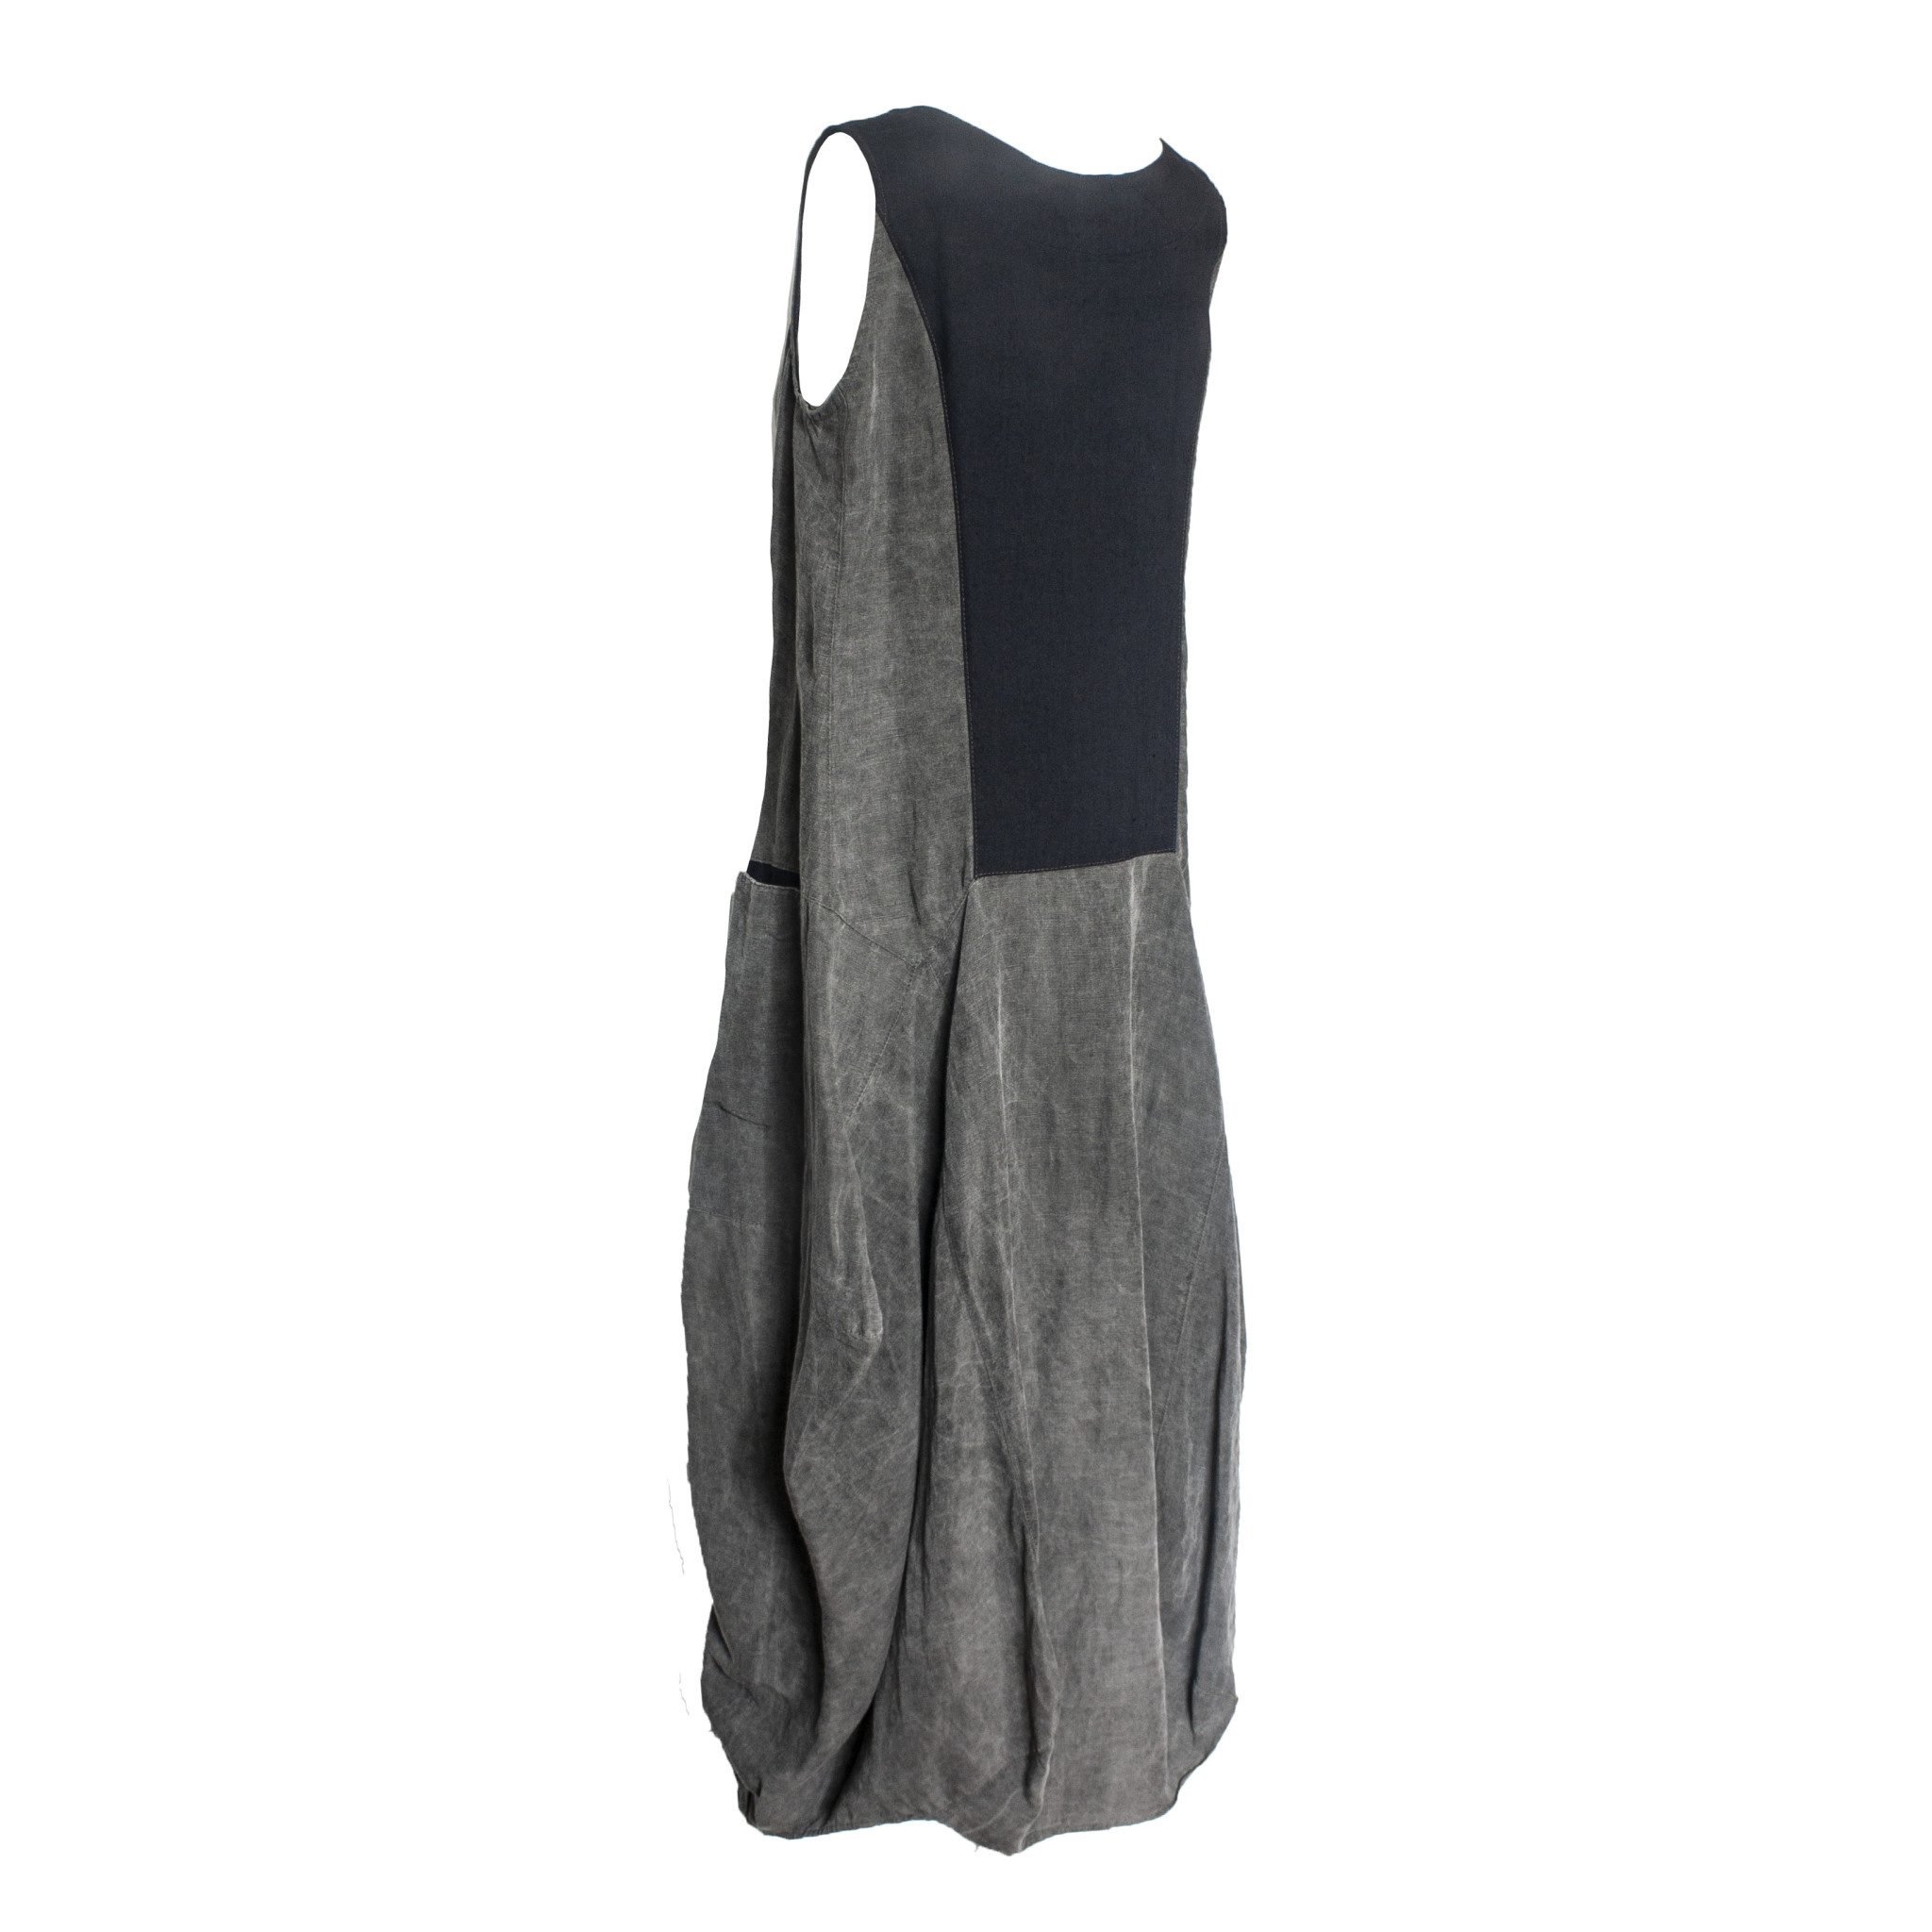 Mara Gibbucci Mara Gibbucci Pocket Dress - Ash/Black